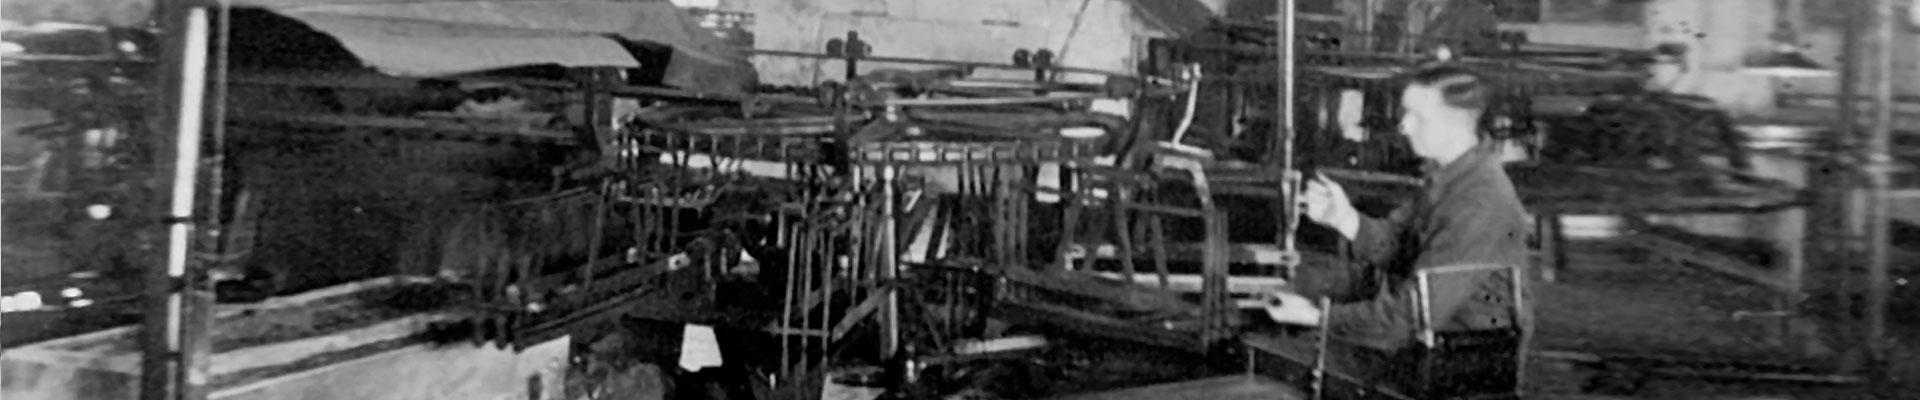 roentgen-historie2